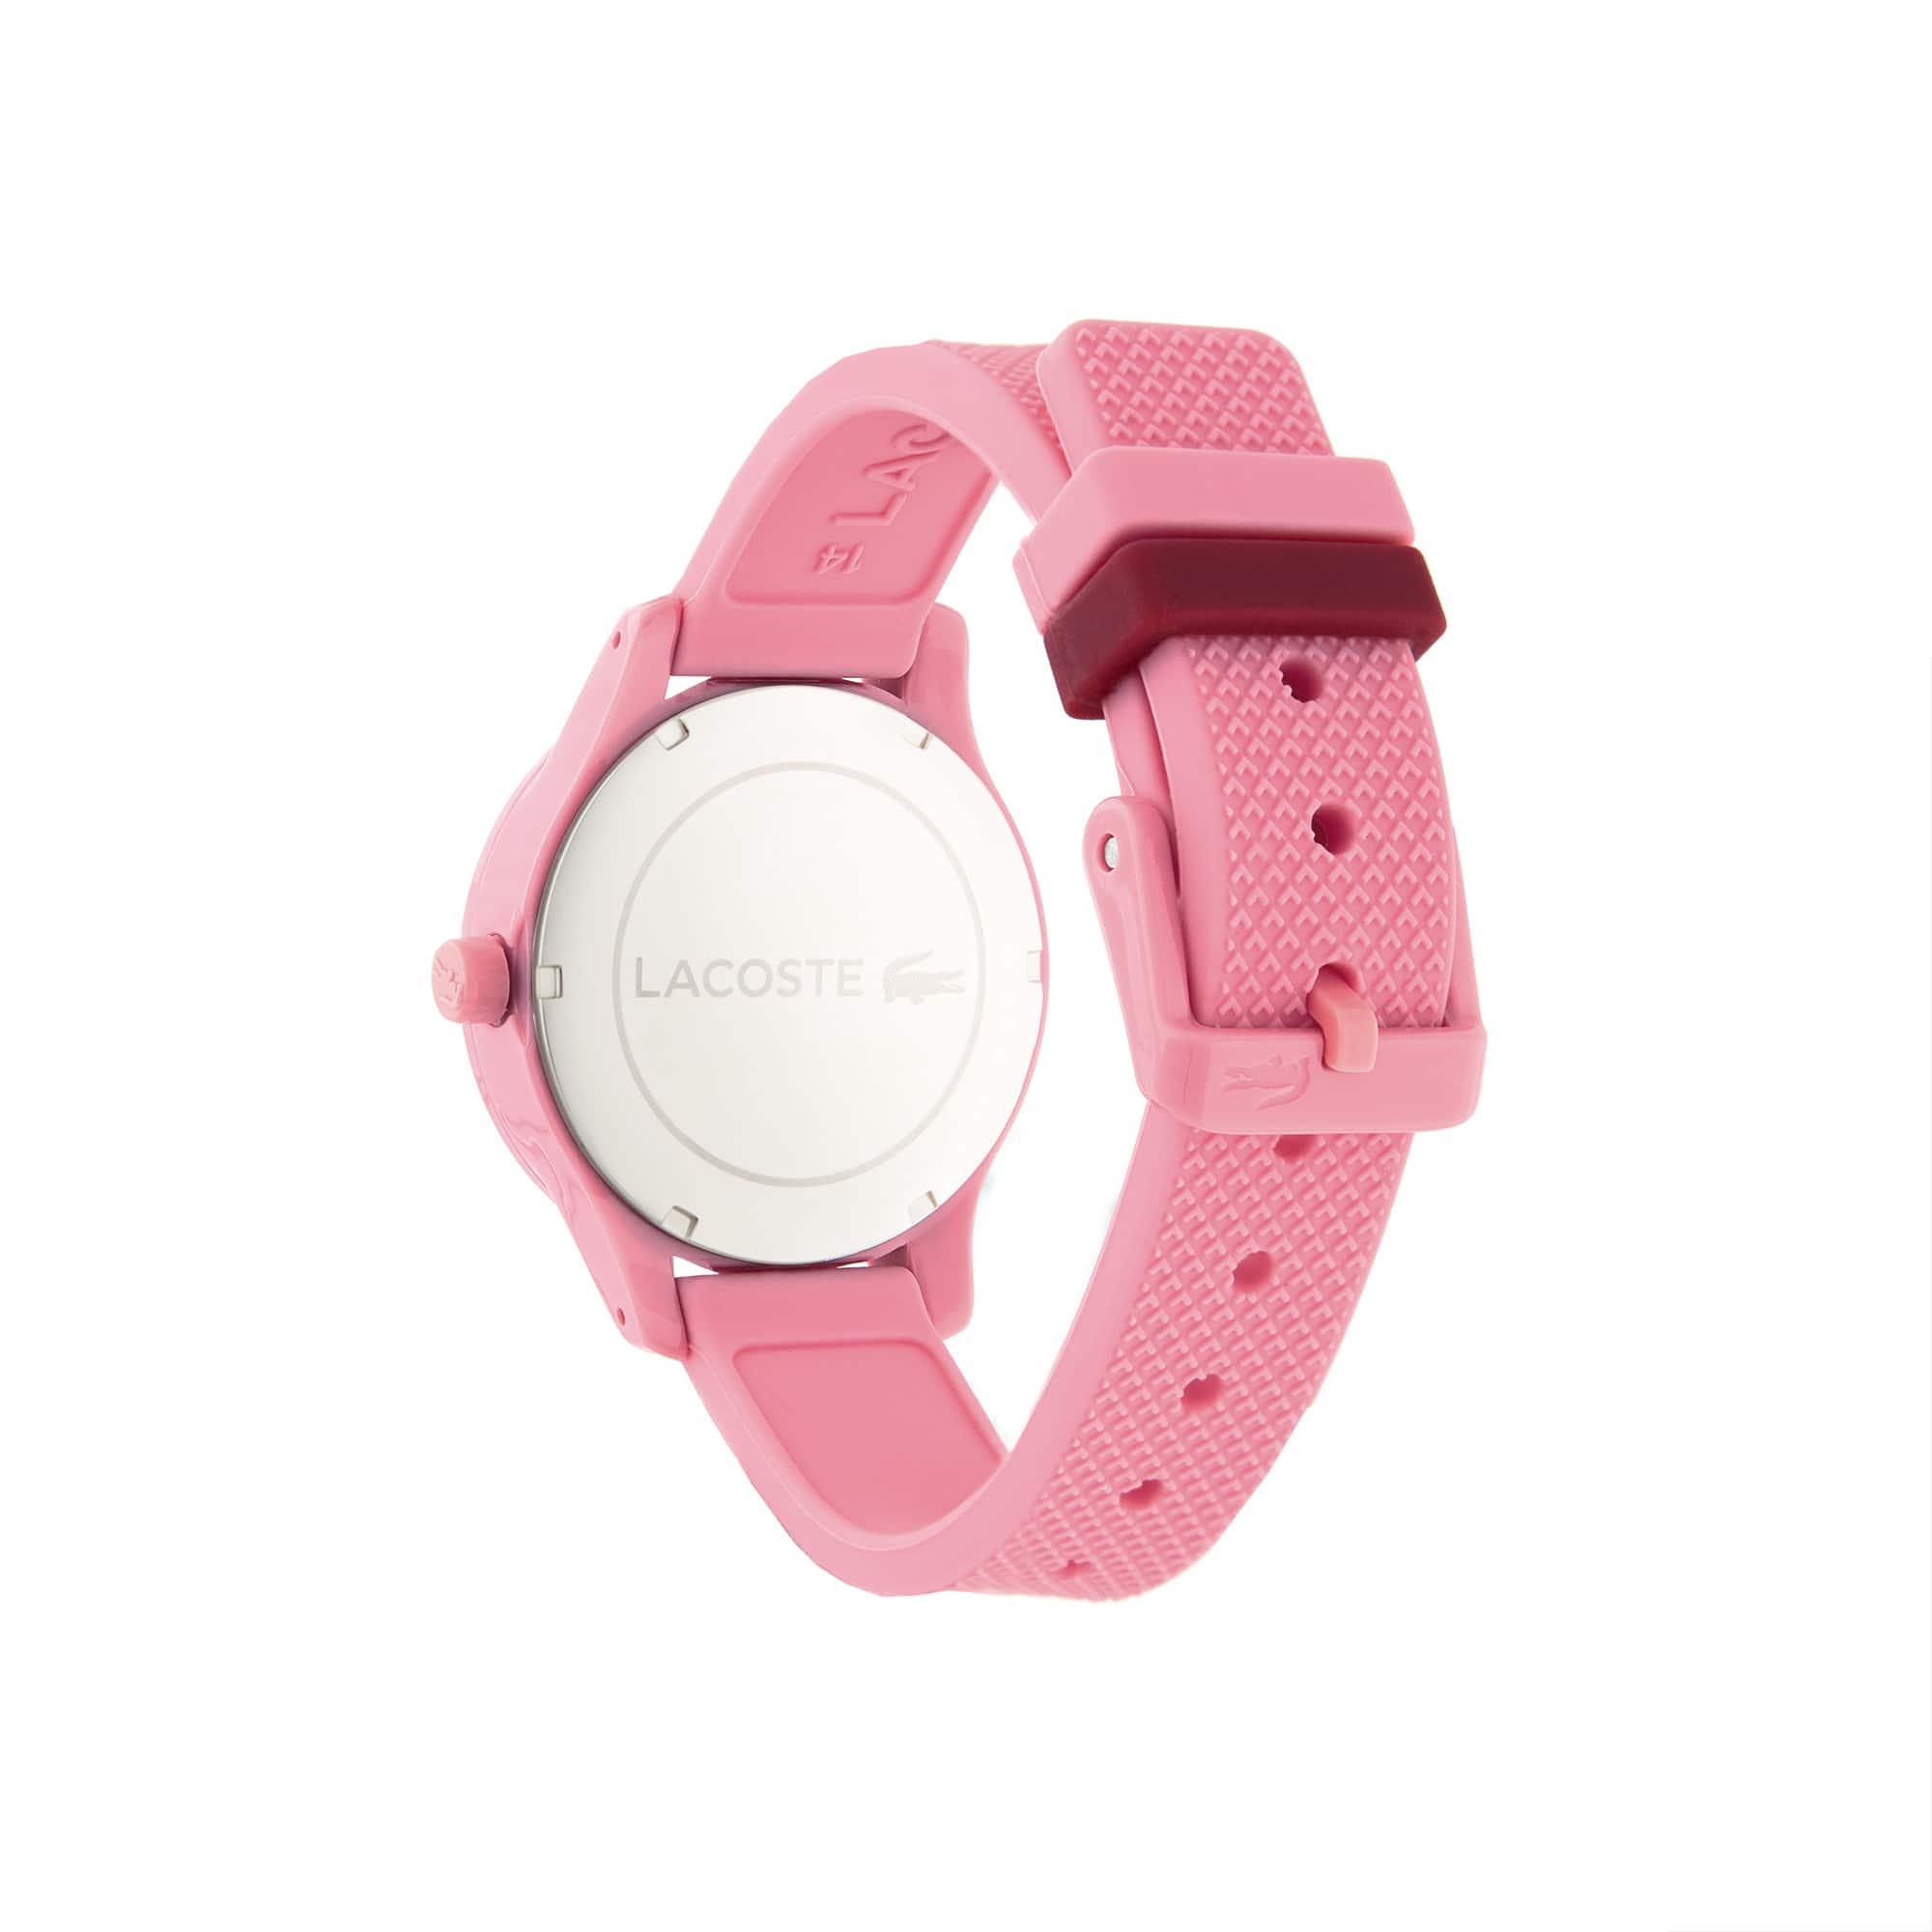 Lacoste - LACOSTE 12.12 Kinderuhr mit pinkem Silikonband - 5